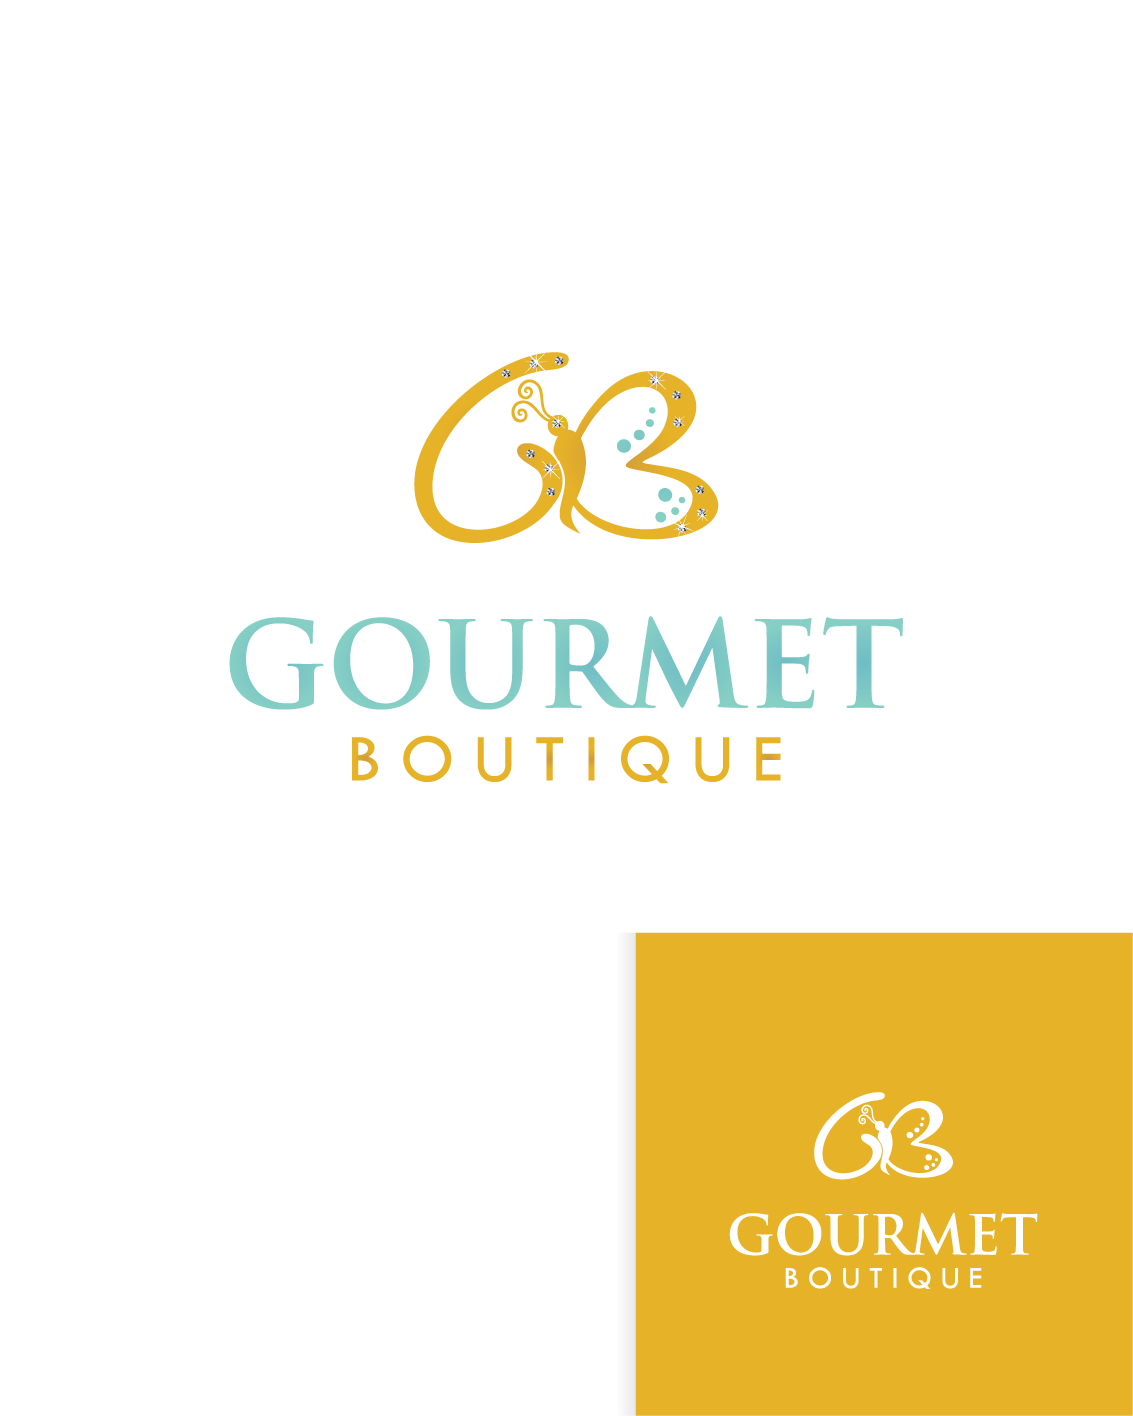 Create the next logo for Gourmet boutique